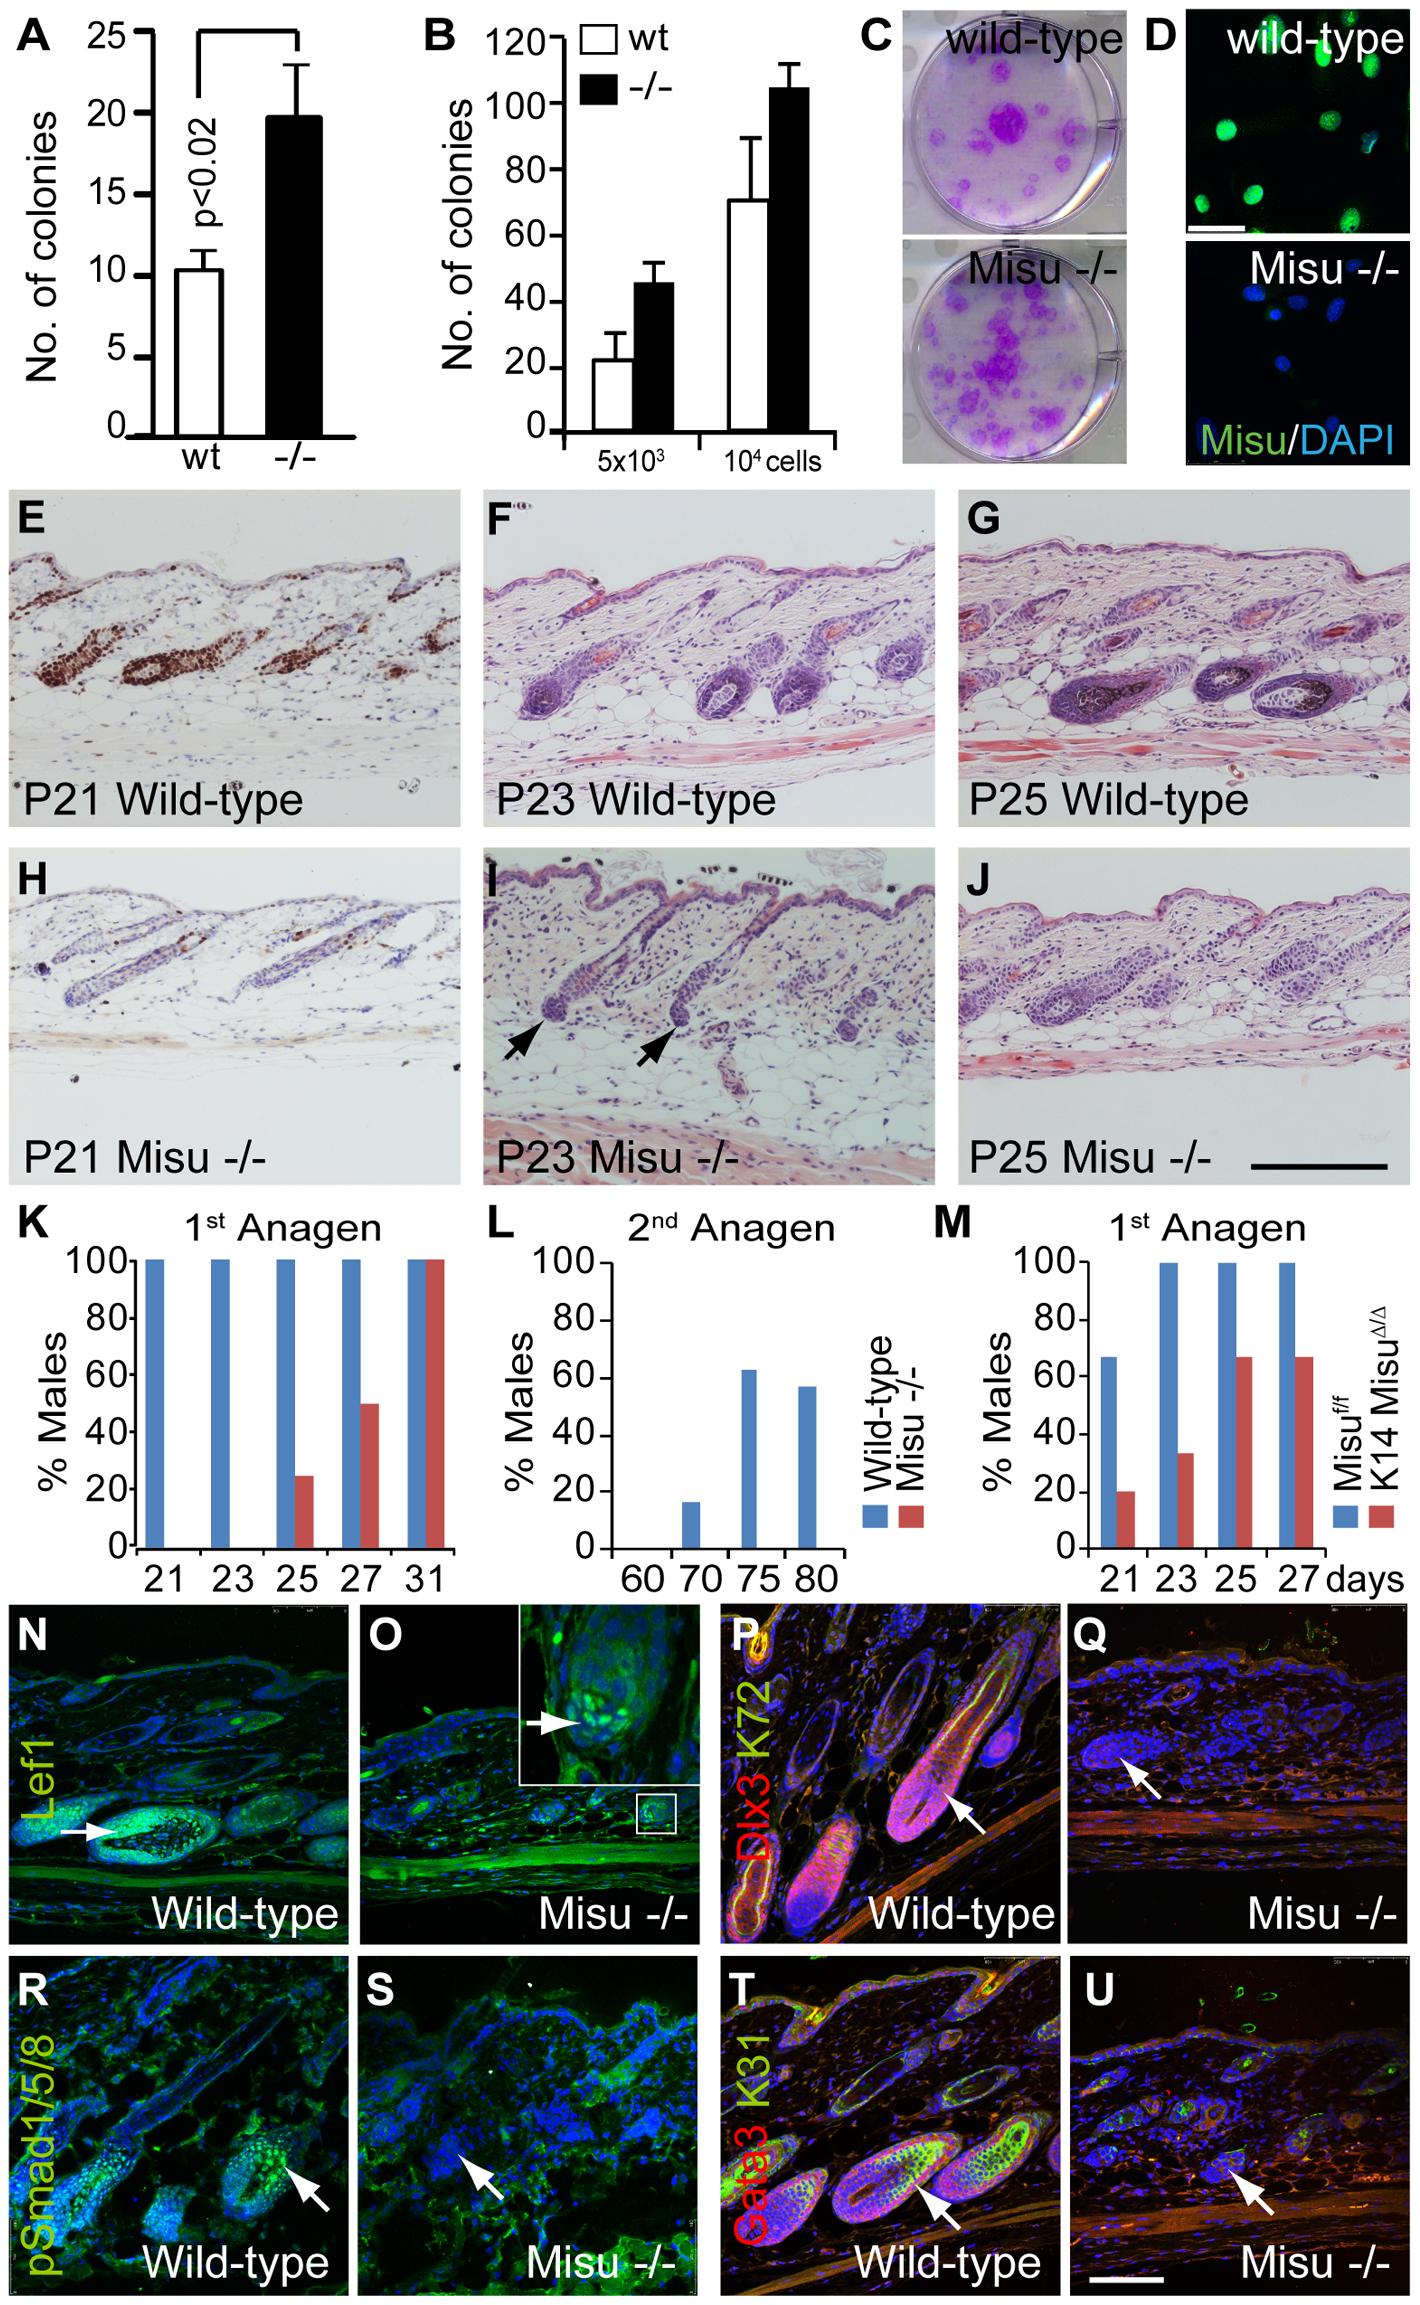 Lack of Misu affects self-renewal of epidermal stem cells.